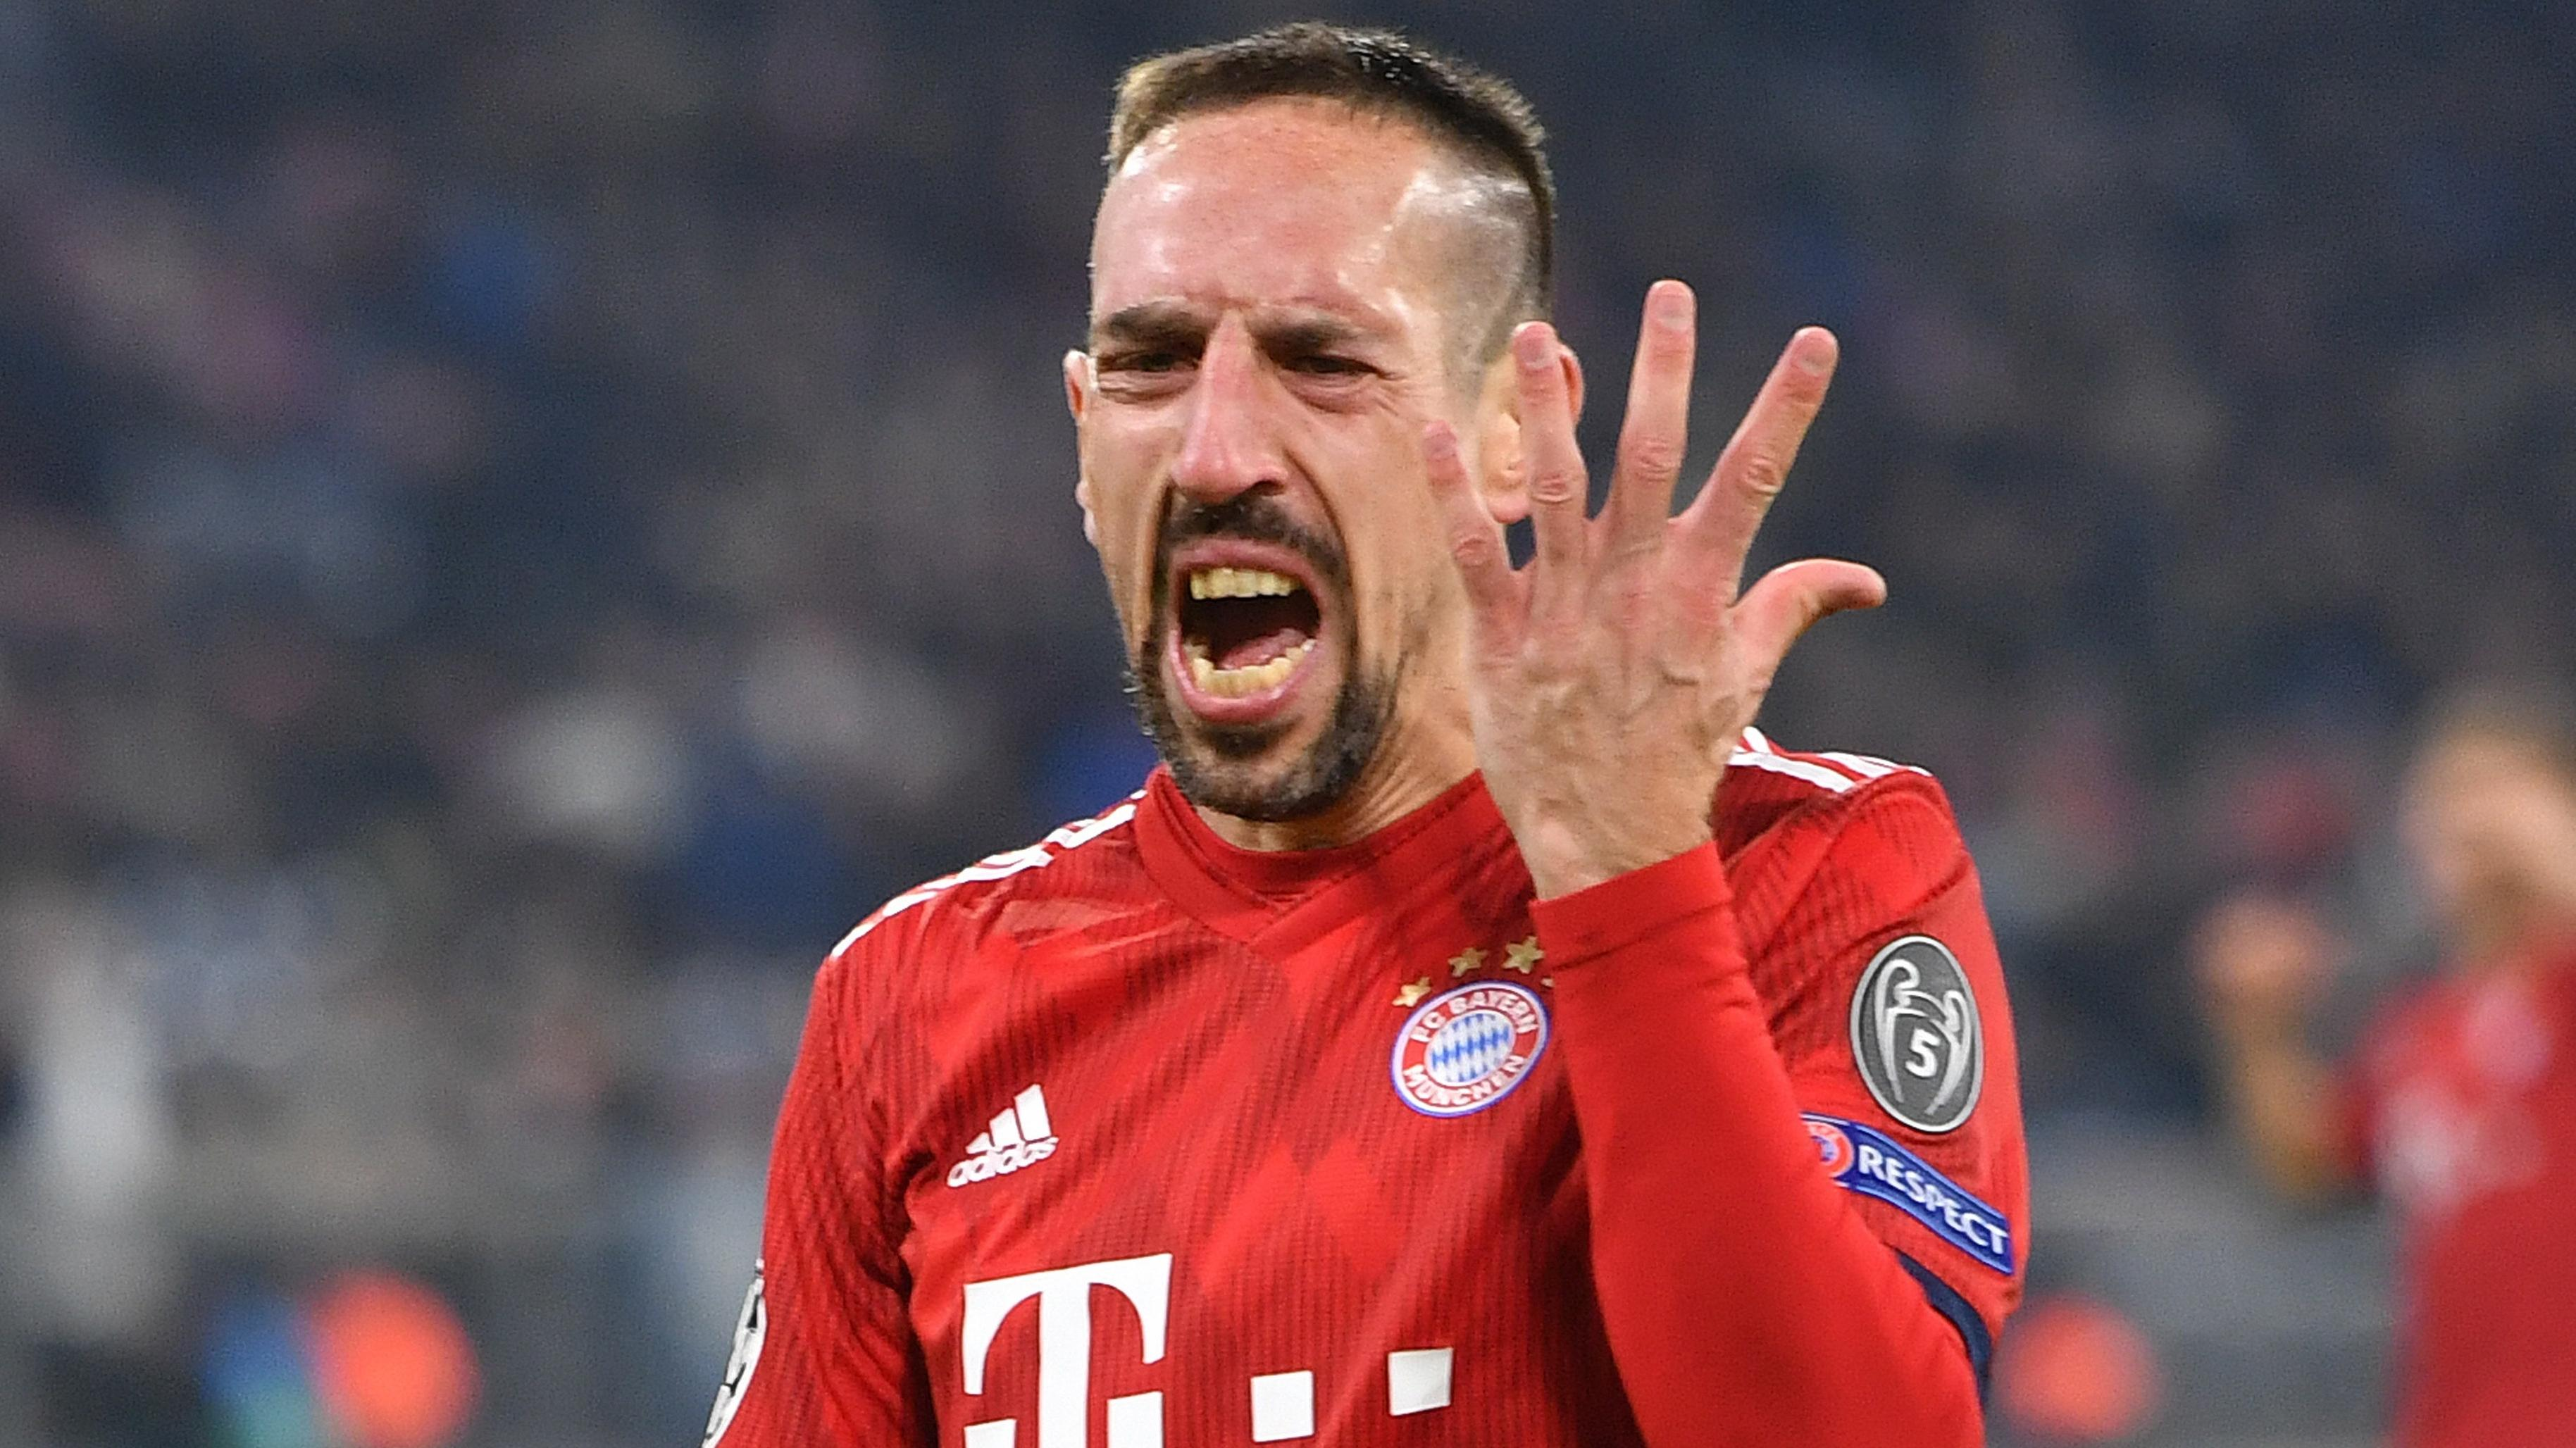 Bayern-Spieler Franck Ribéry